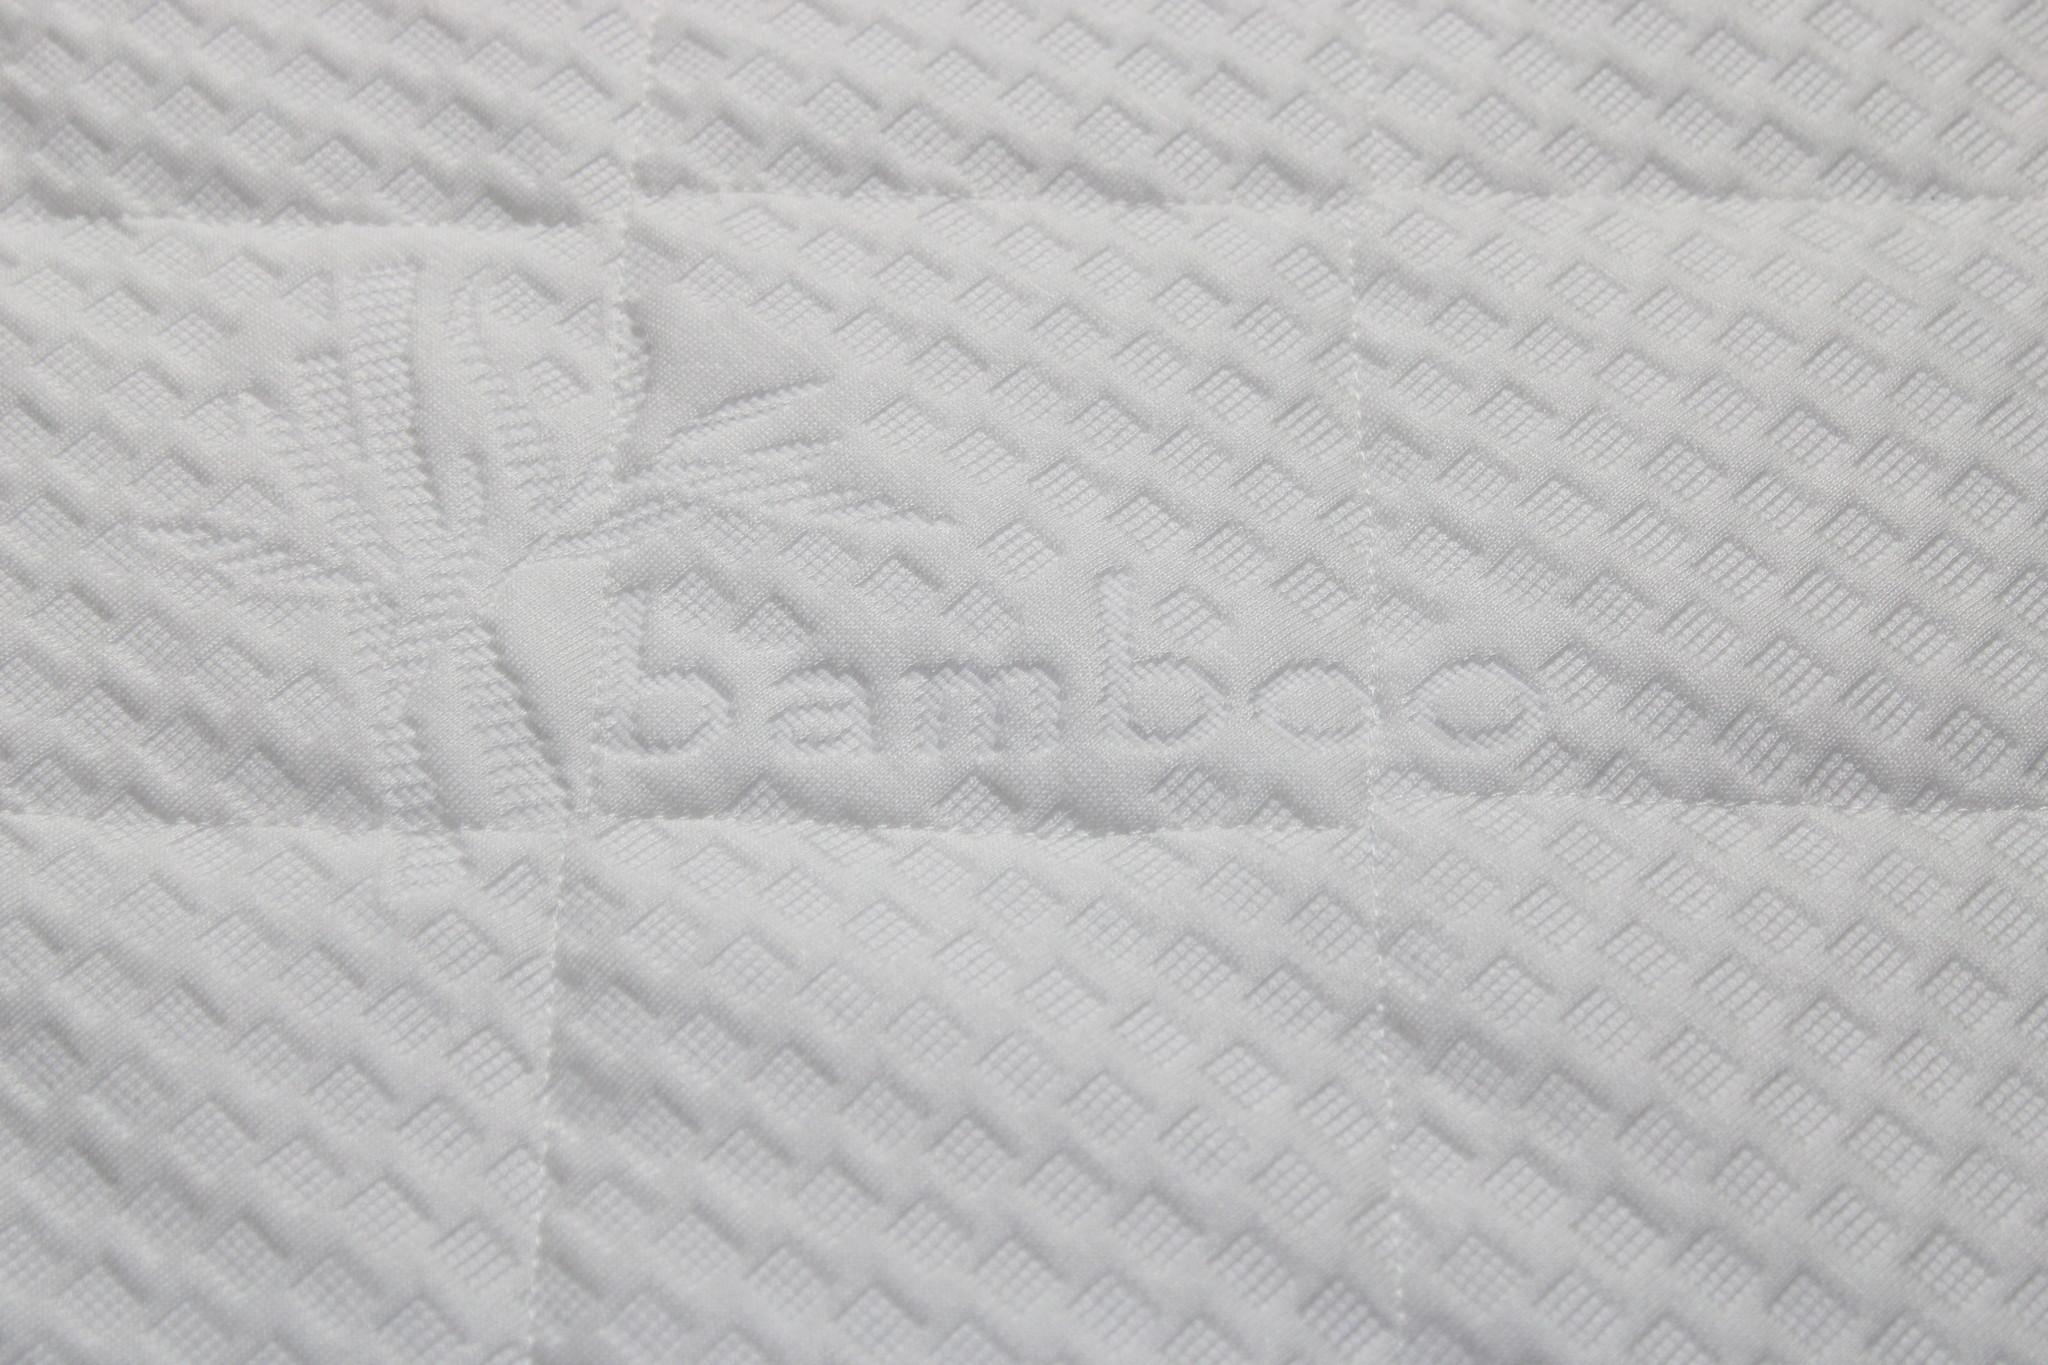 Sarpy Kindermatras 90x190 koudschuim hr40 bamboo